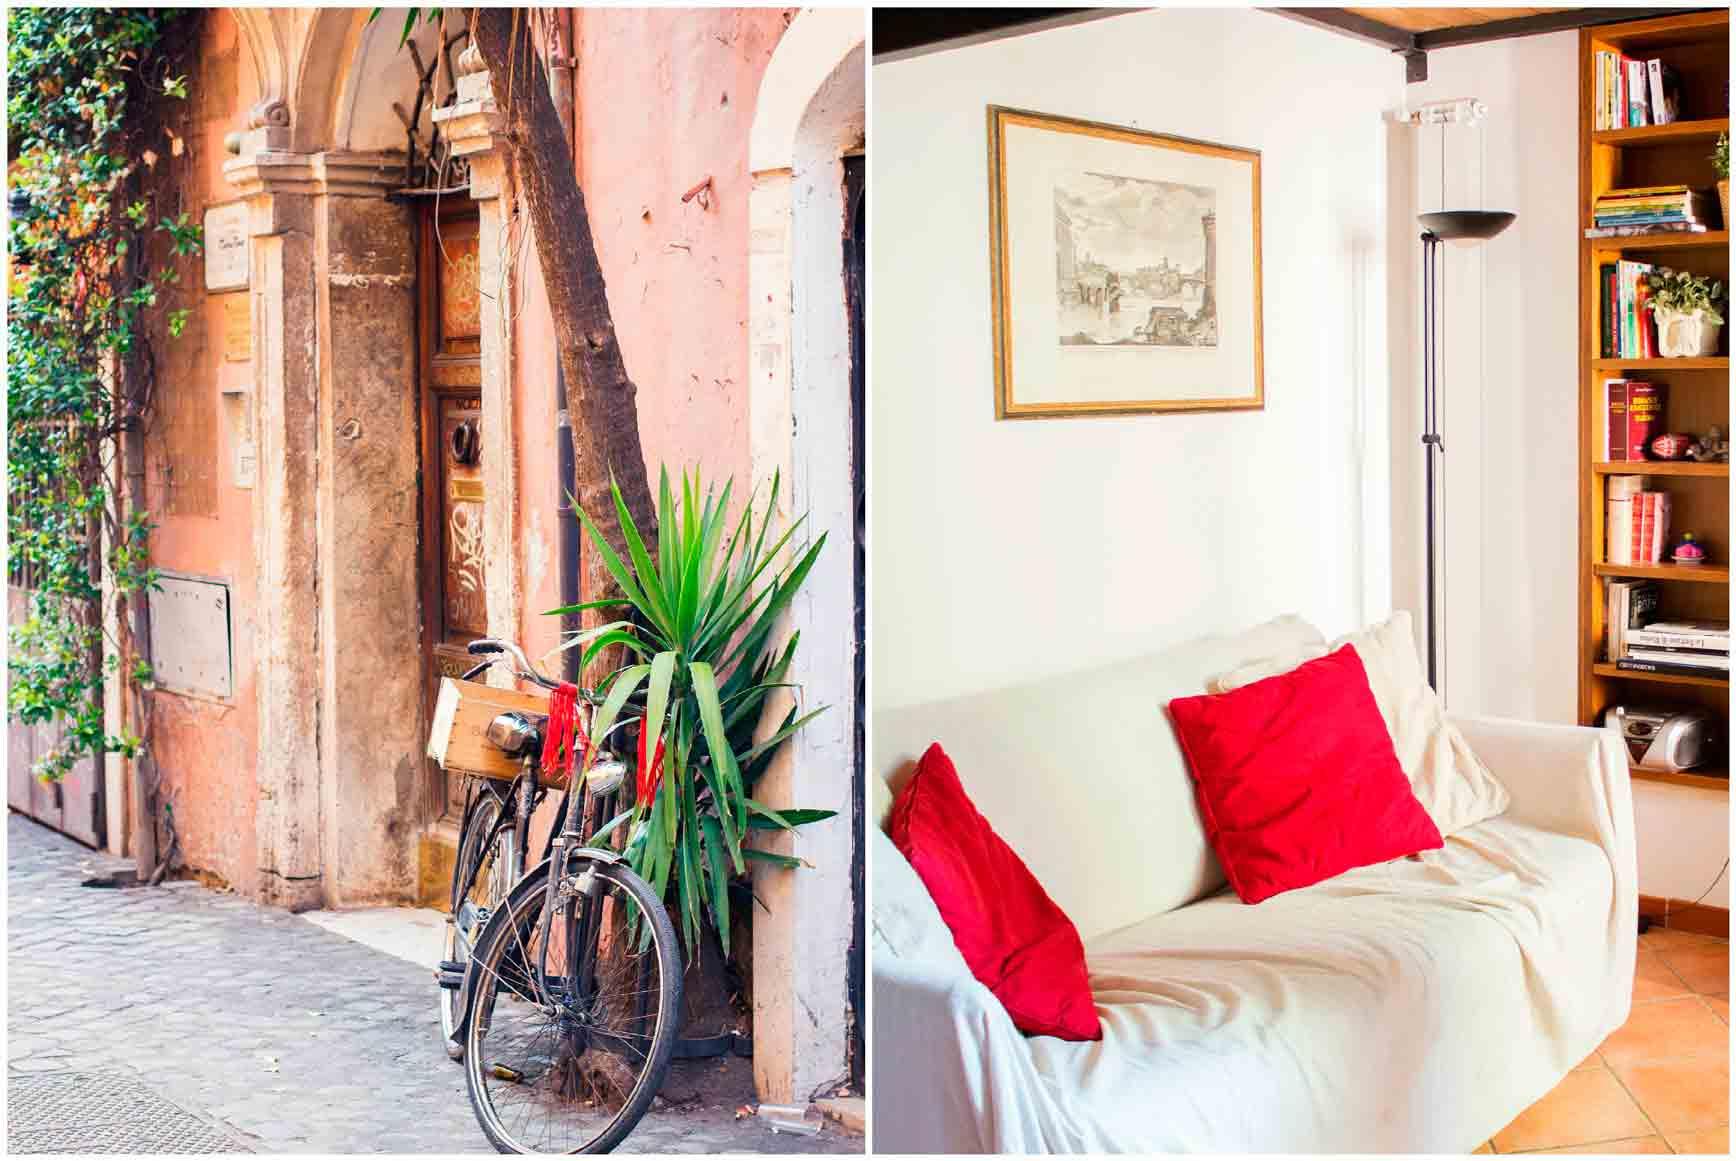 roma_airbnb_clarabmartin2